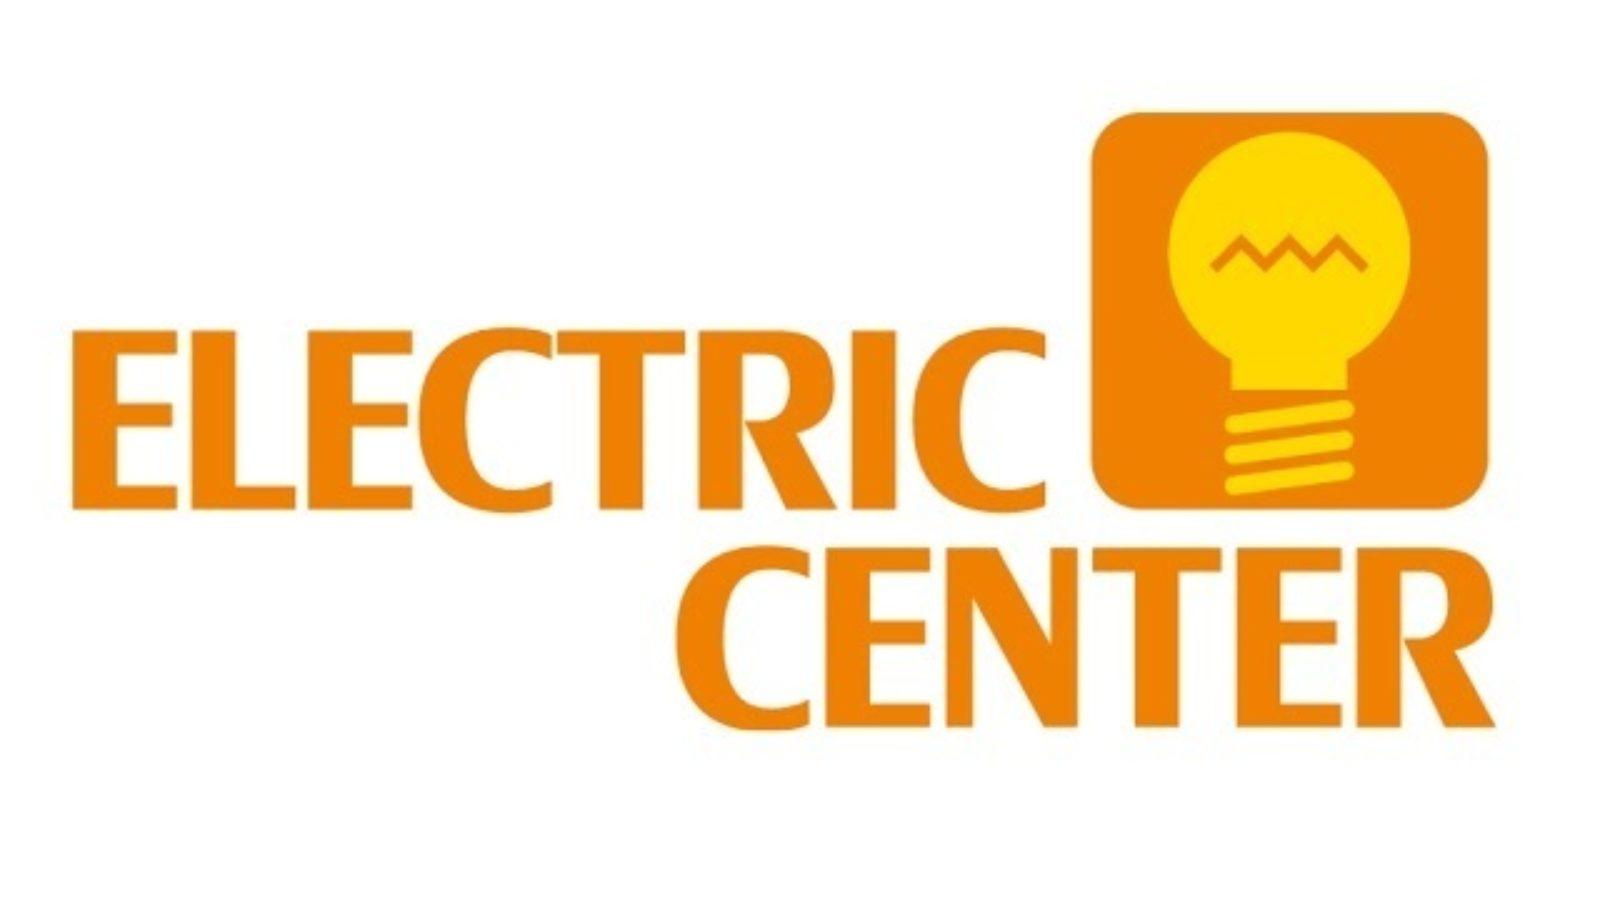 Aberdeen's Electric Center urge lighting health check